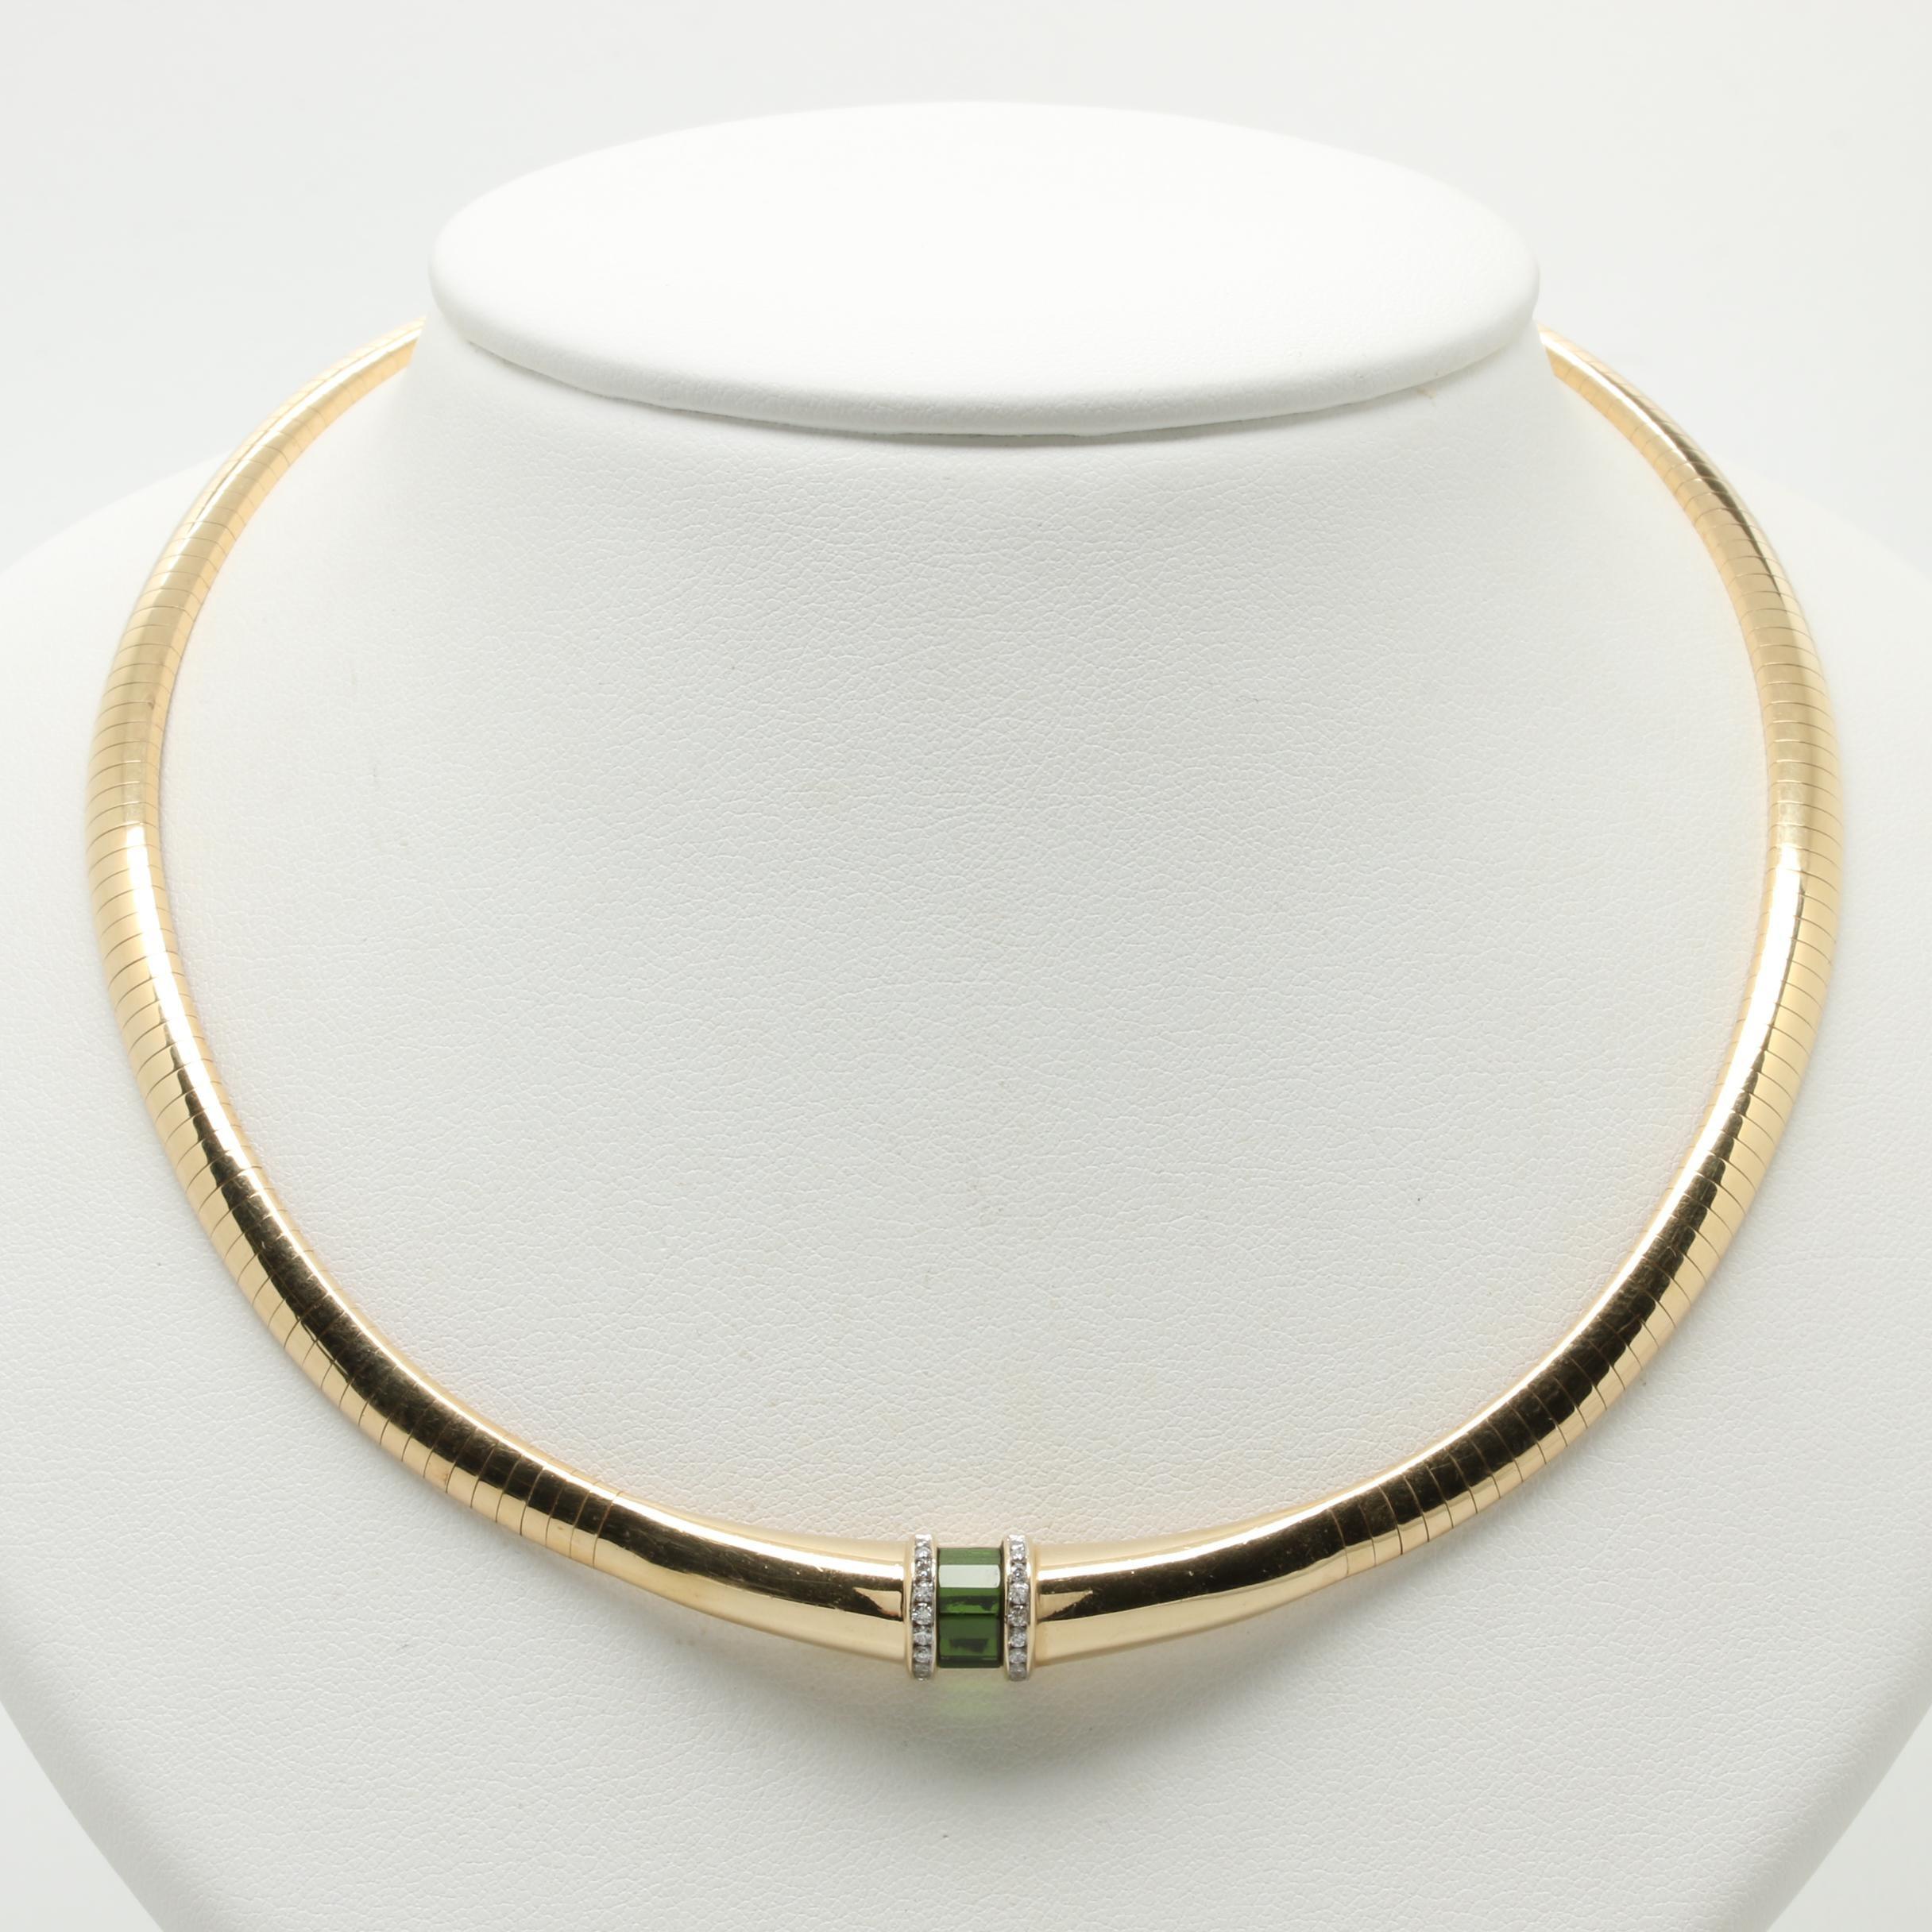 Scott Keating 14K Yellow Gold Tourmaline and Diamond Omega Necklace